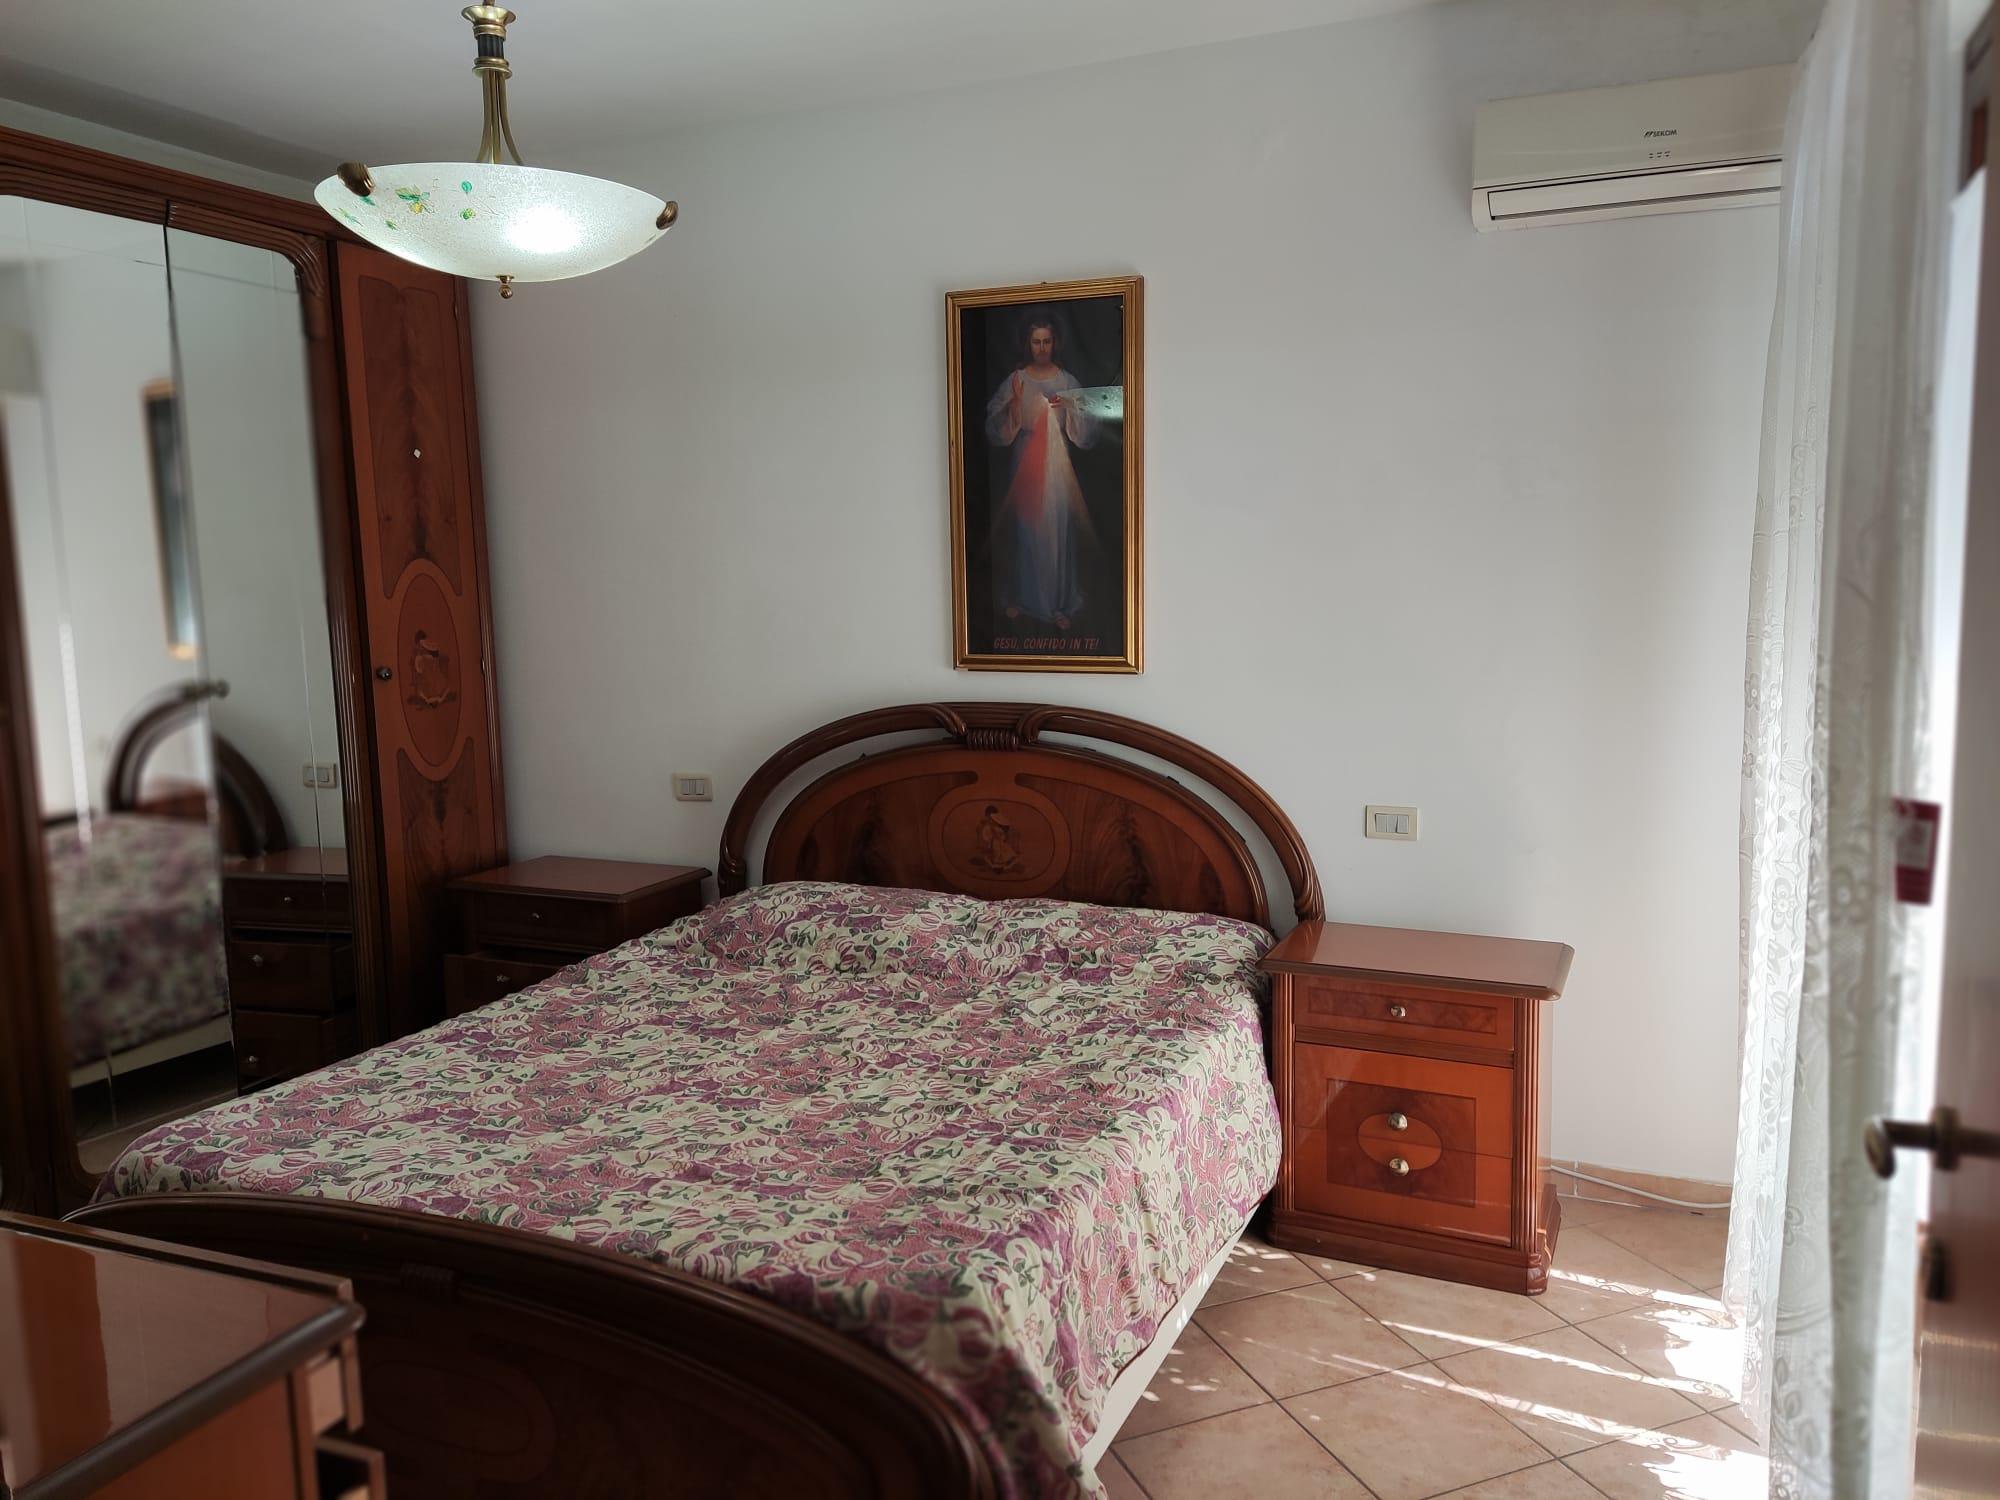 Affittasi a Porto D'Ascoli  appartamento con ingresso indipendente e giardino.